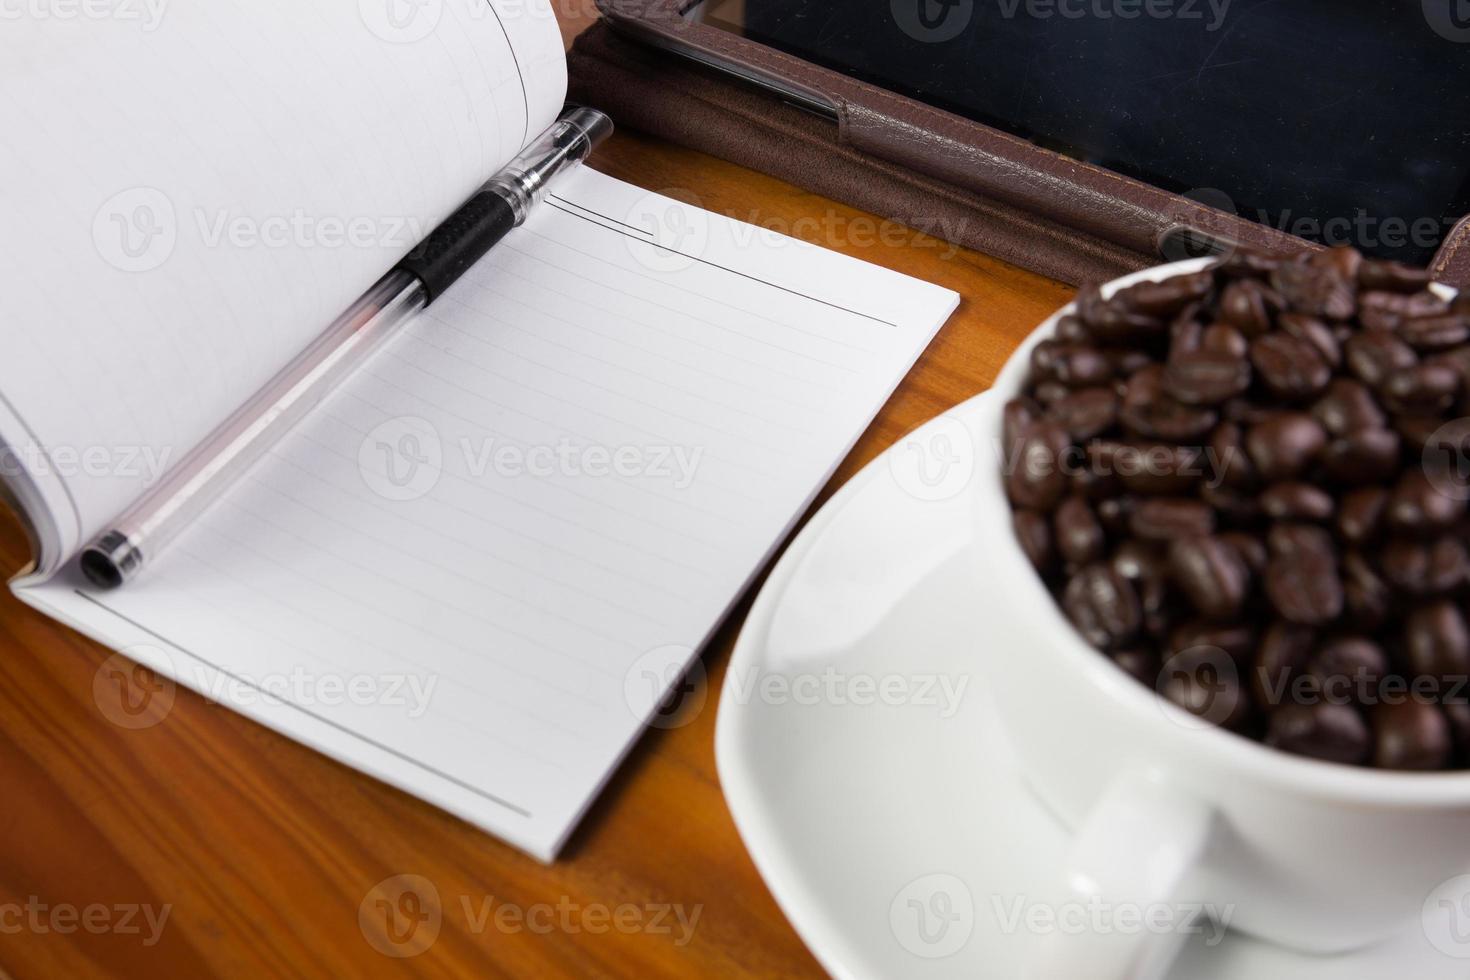 digitale tablet pc op bureau met leeg wit scherm foto